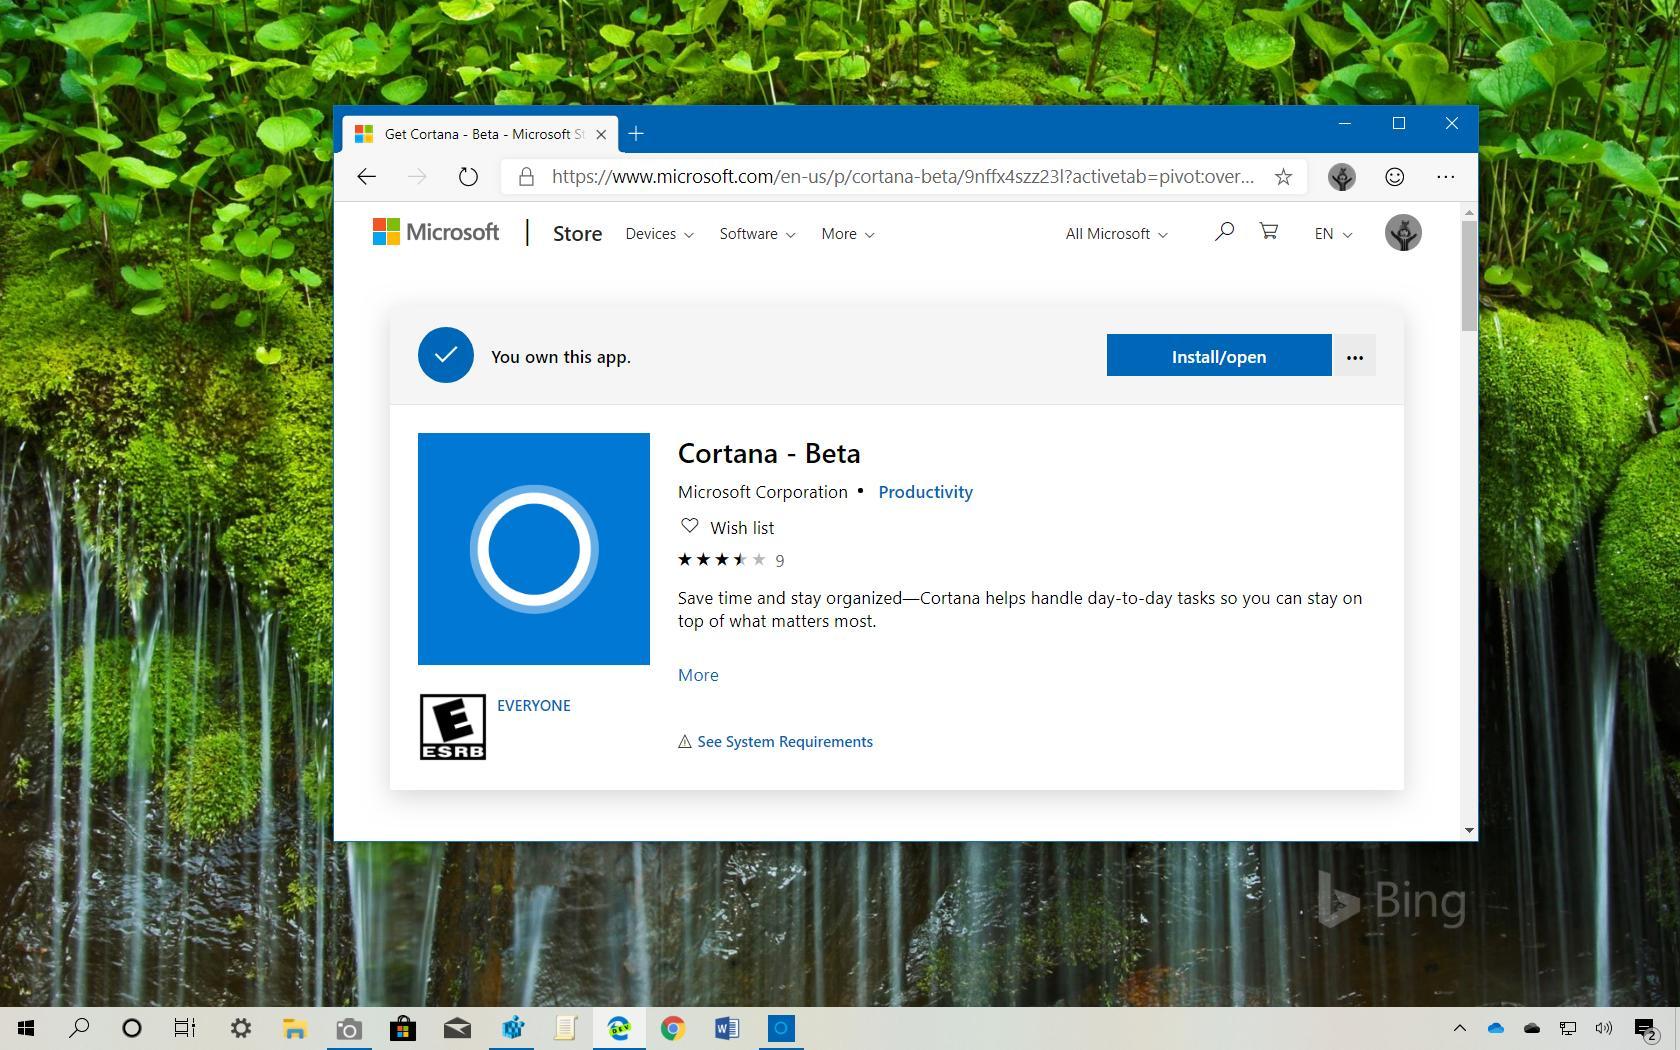 Cortana app for Windows 10